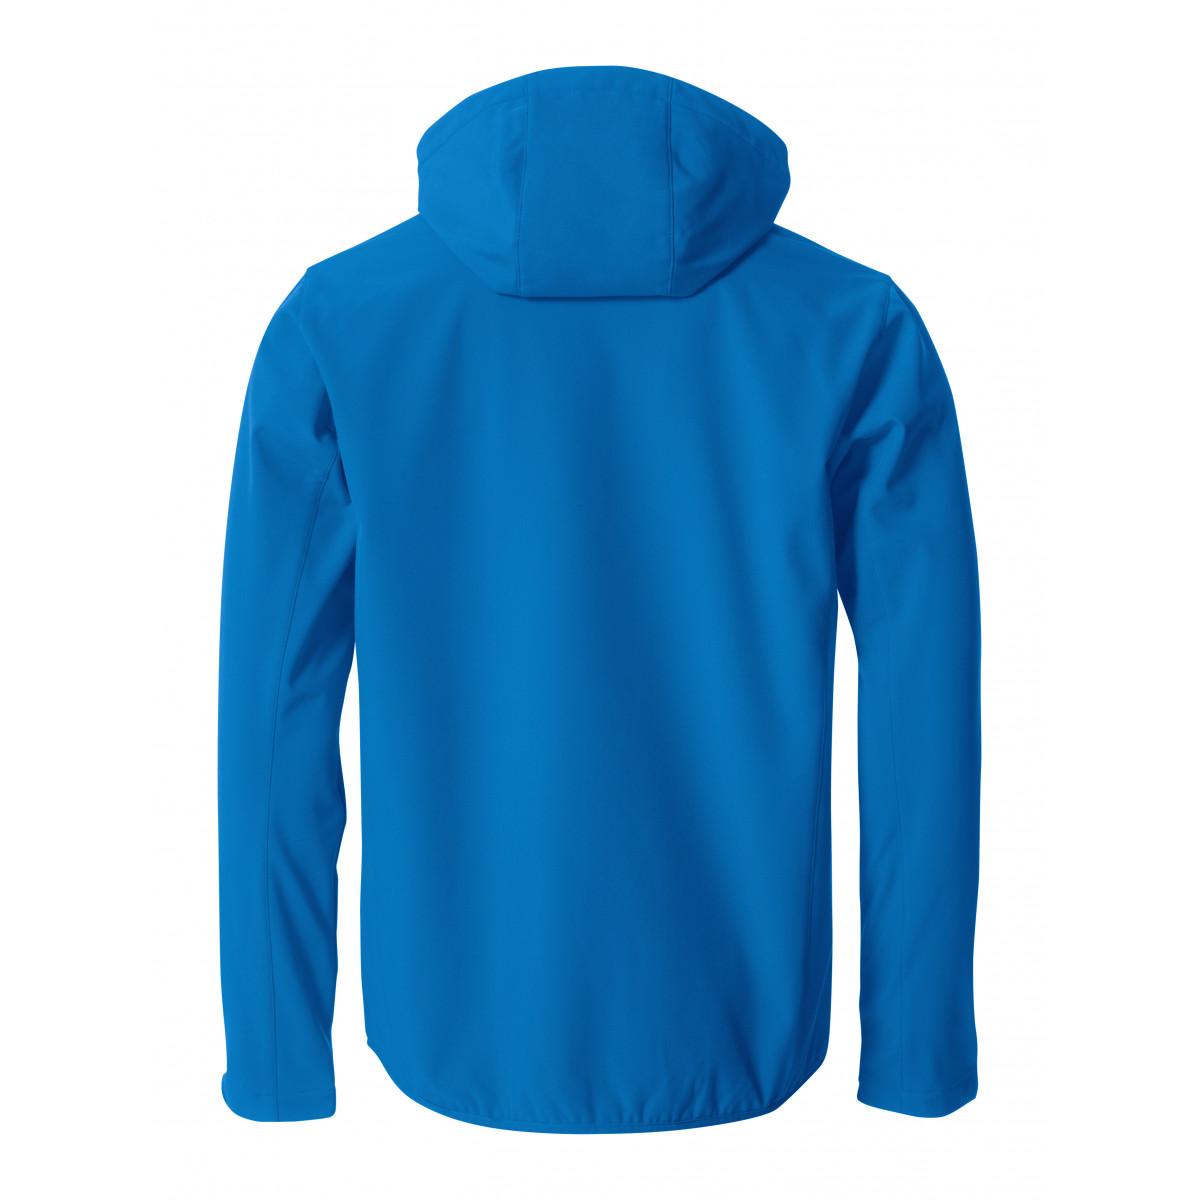 Ветровка мужская 020912 Basic Hoody Softshell - Ярко-синий